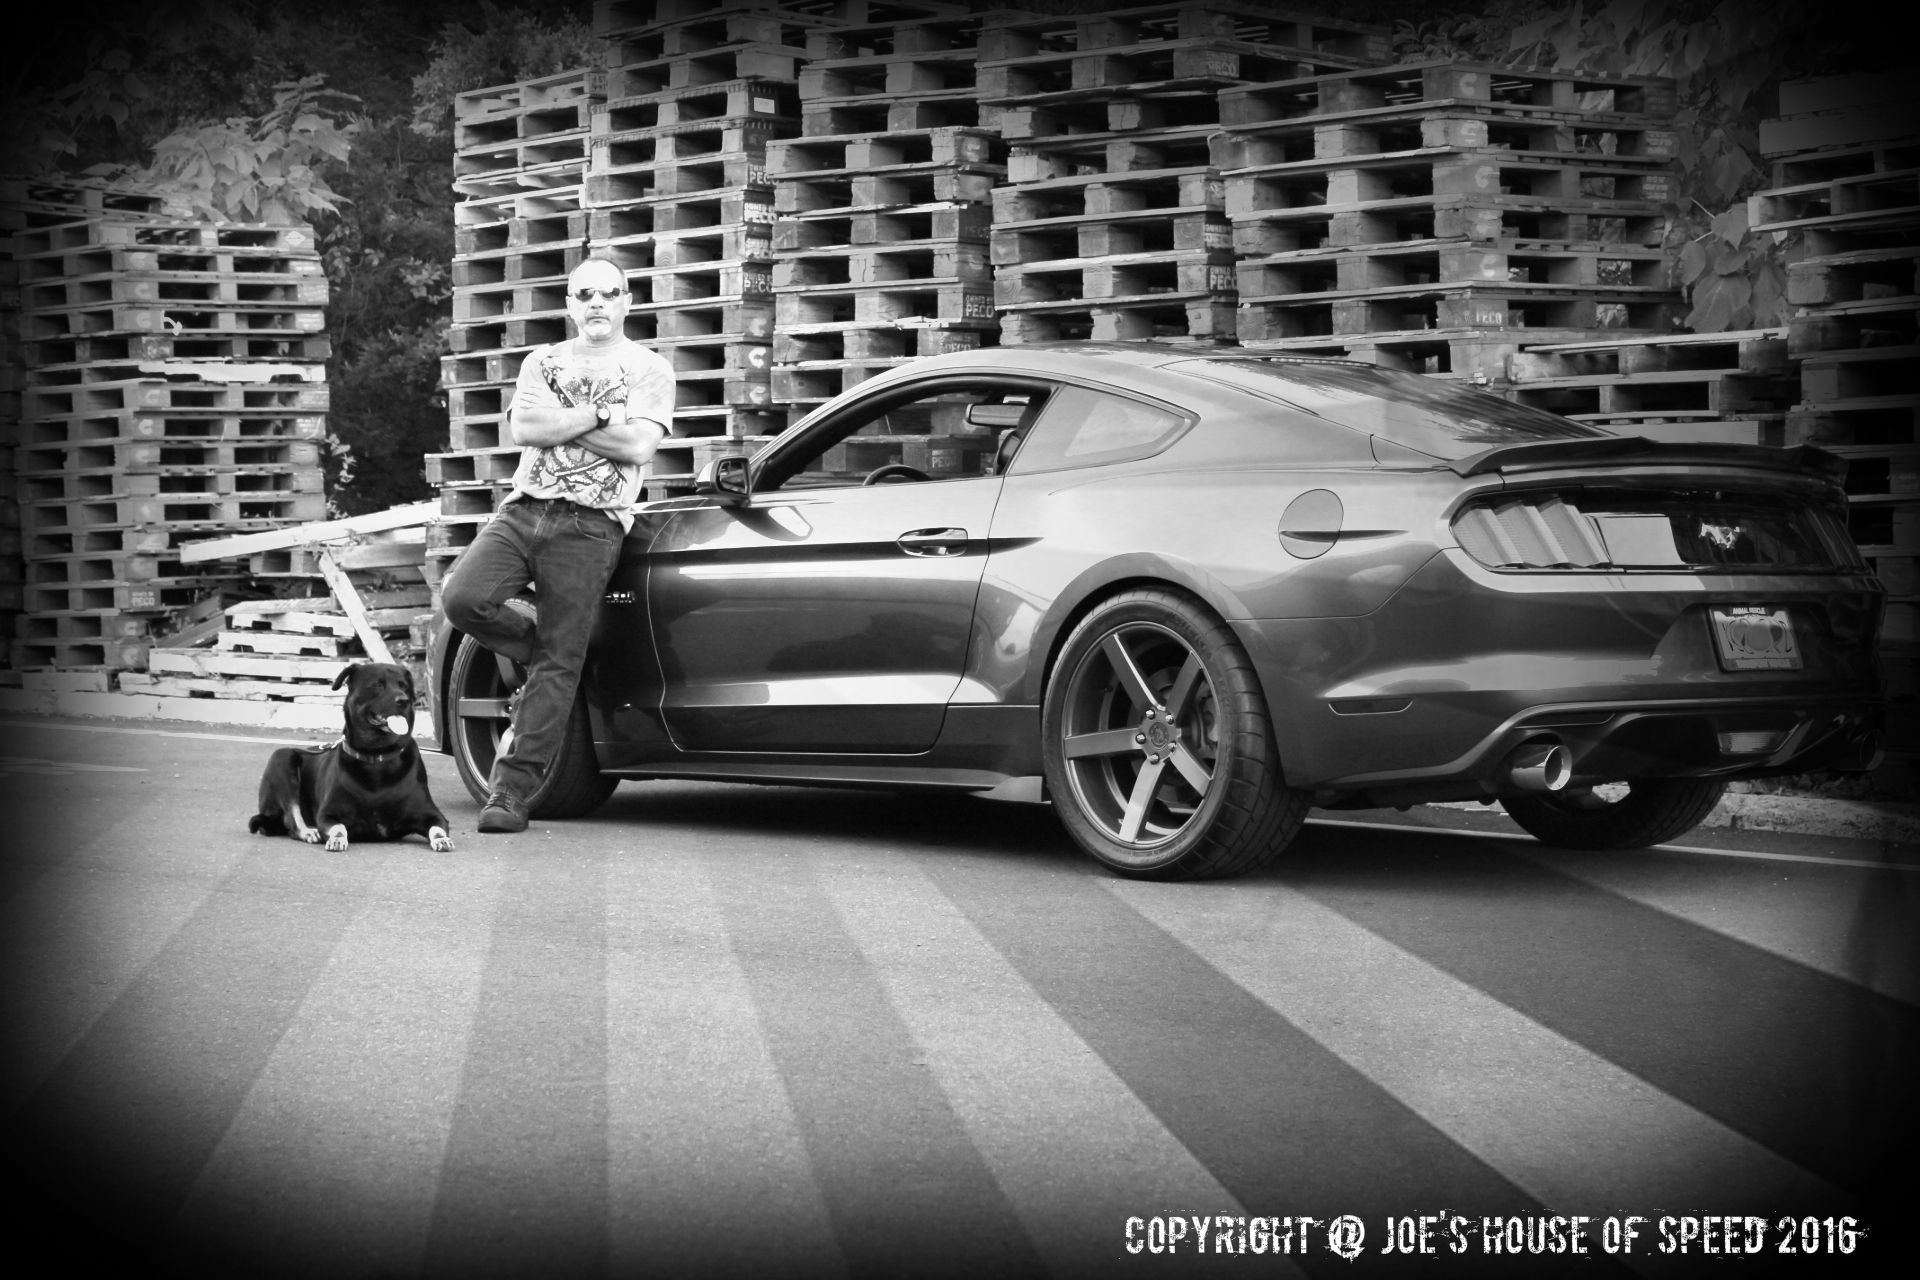 Pin By Joe S House Of Speed On Joe S House Of Speed Car Bmw Car Suv Car